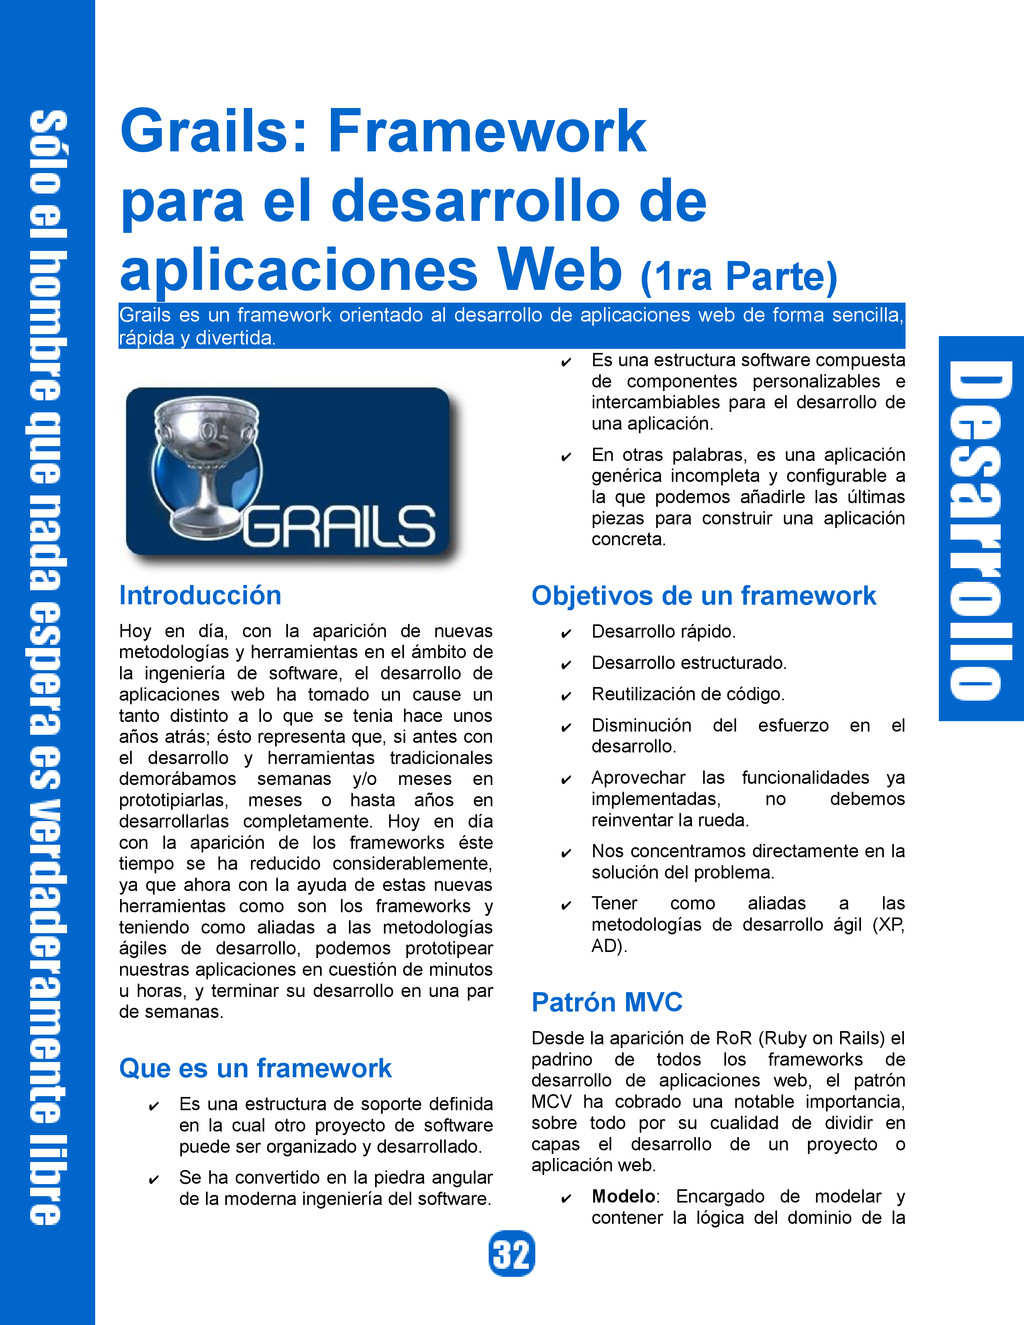 Grails: Framework para el desarrollo de aplicac...